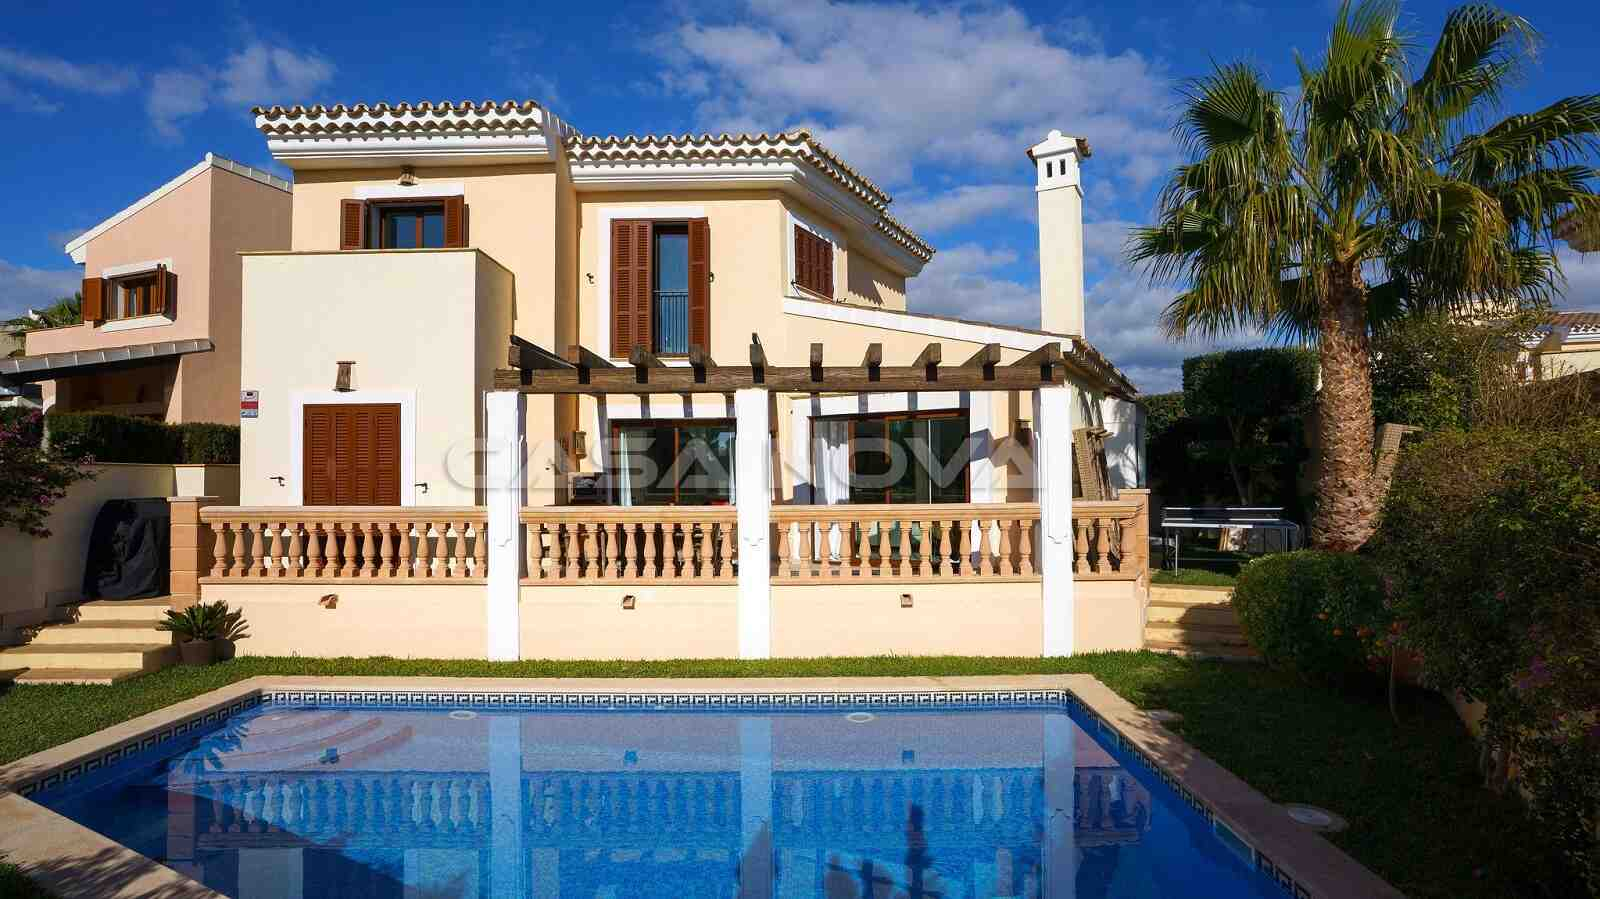 Ref. 2303031 - Mediterrane Mallorca Villa mit Pool am Golfplatz